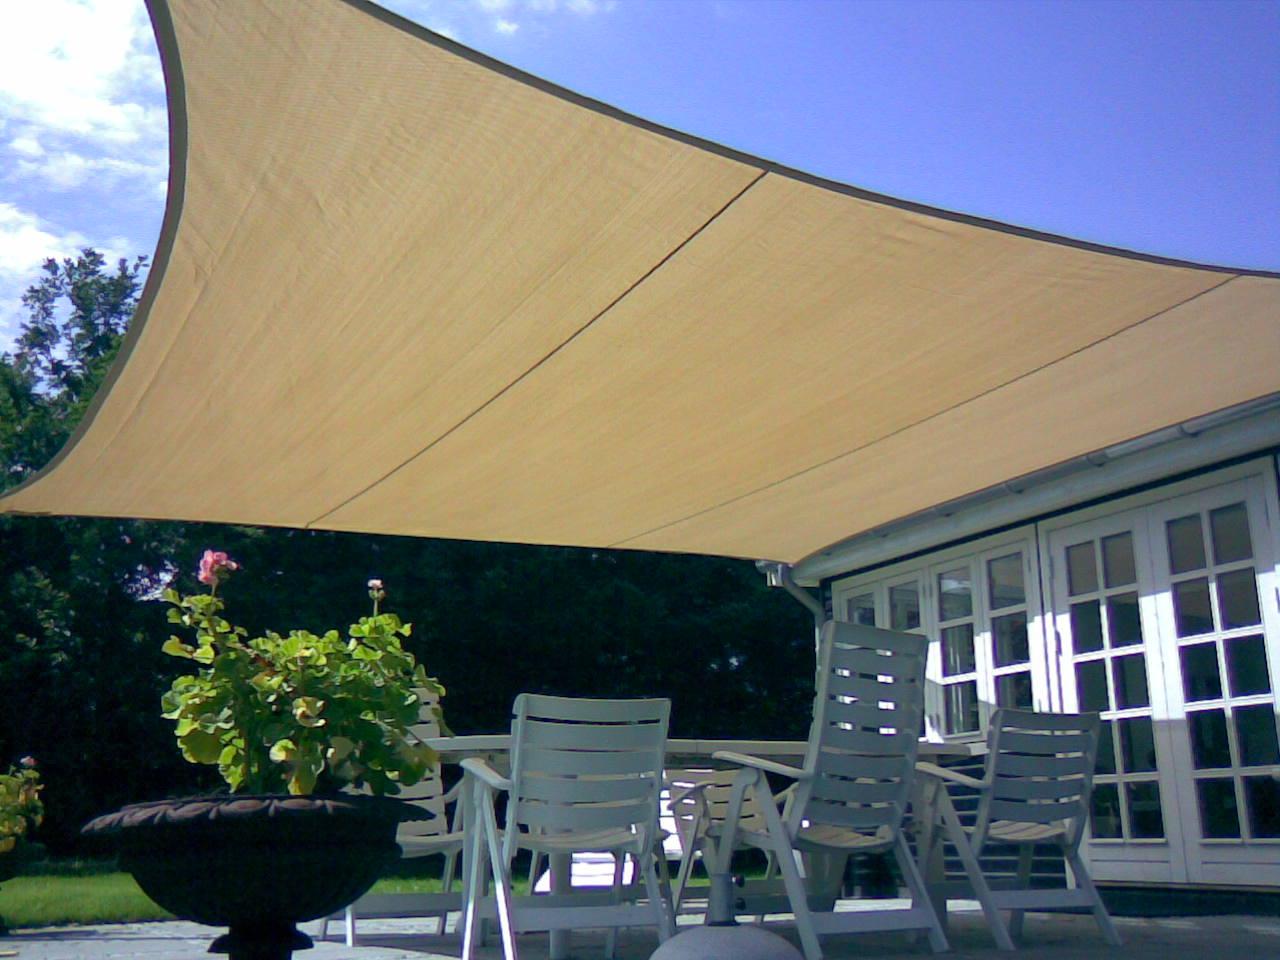 Tenda A Vela Quadrata : Vela ombreggiante quadrata mt ecrù giardino telo copertura